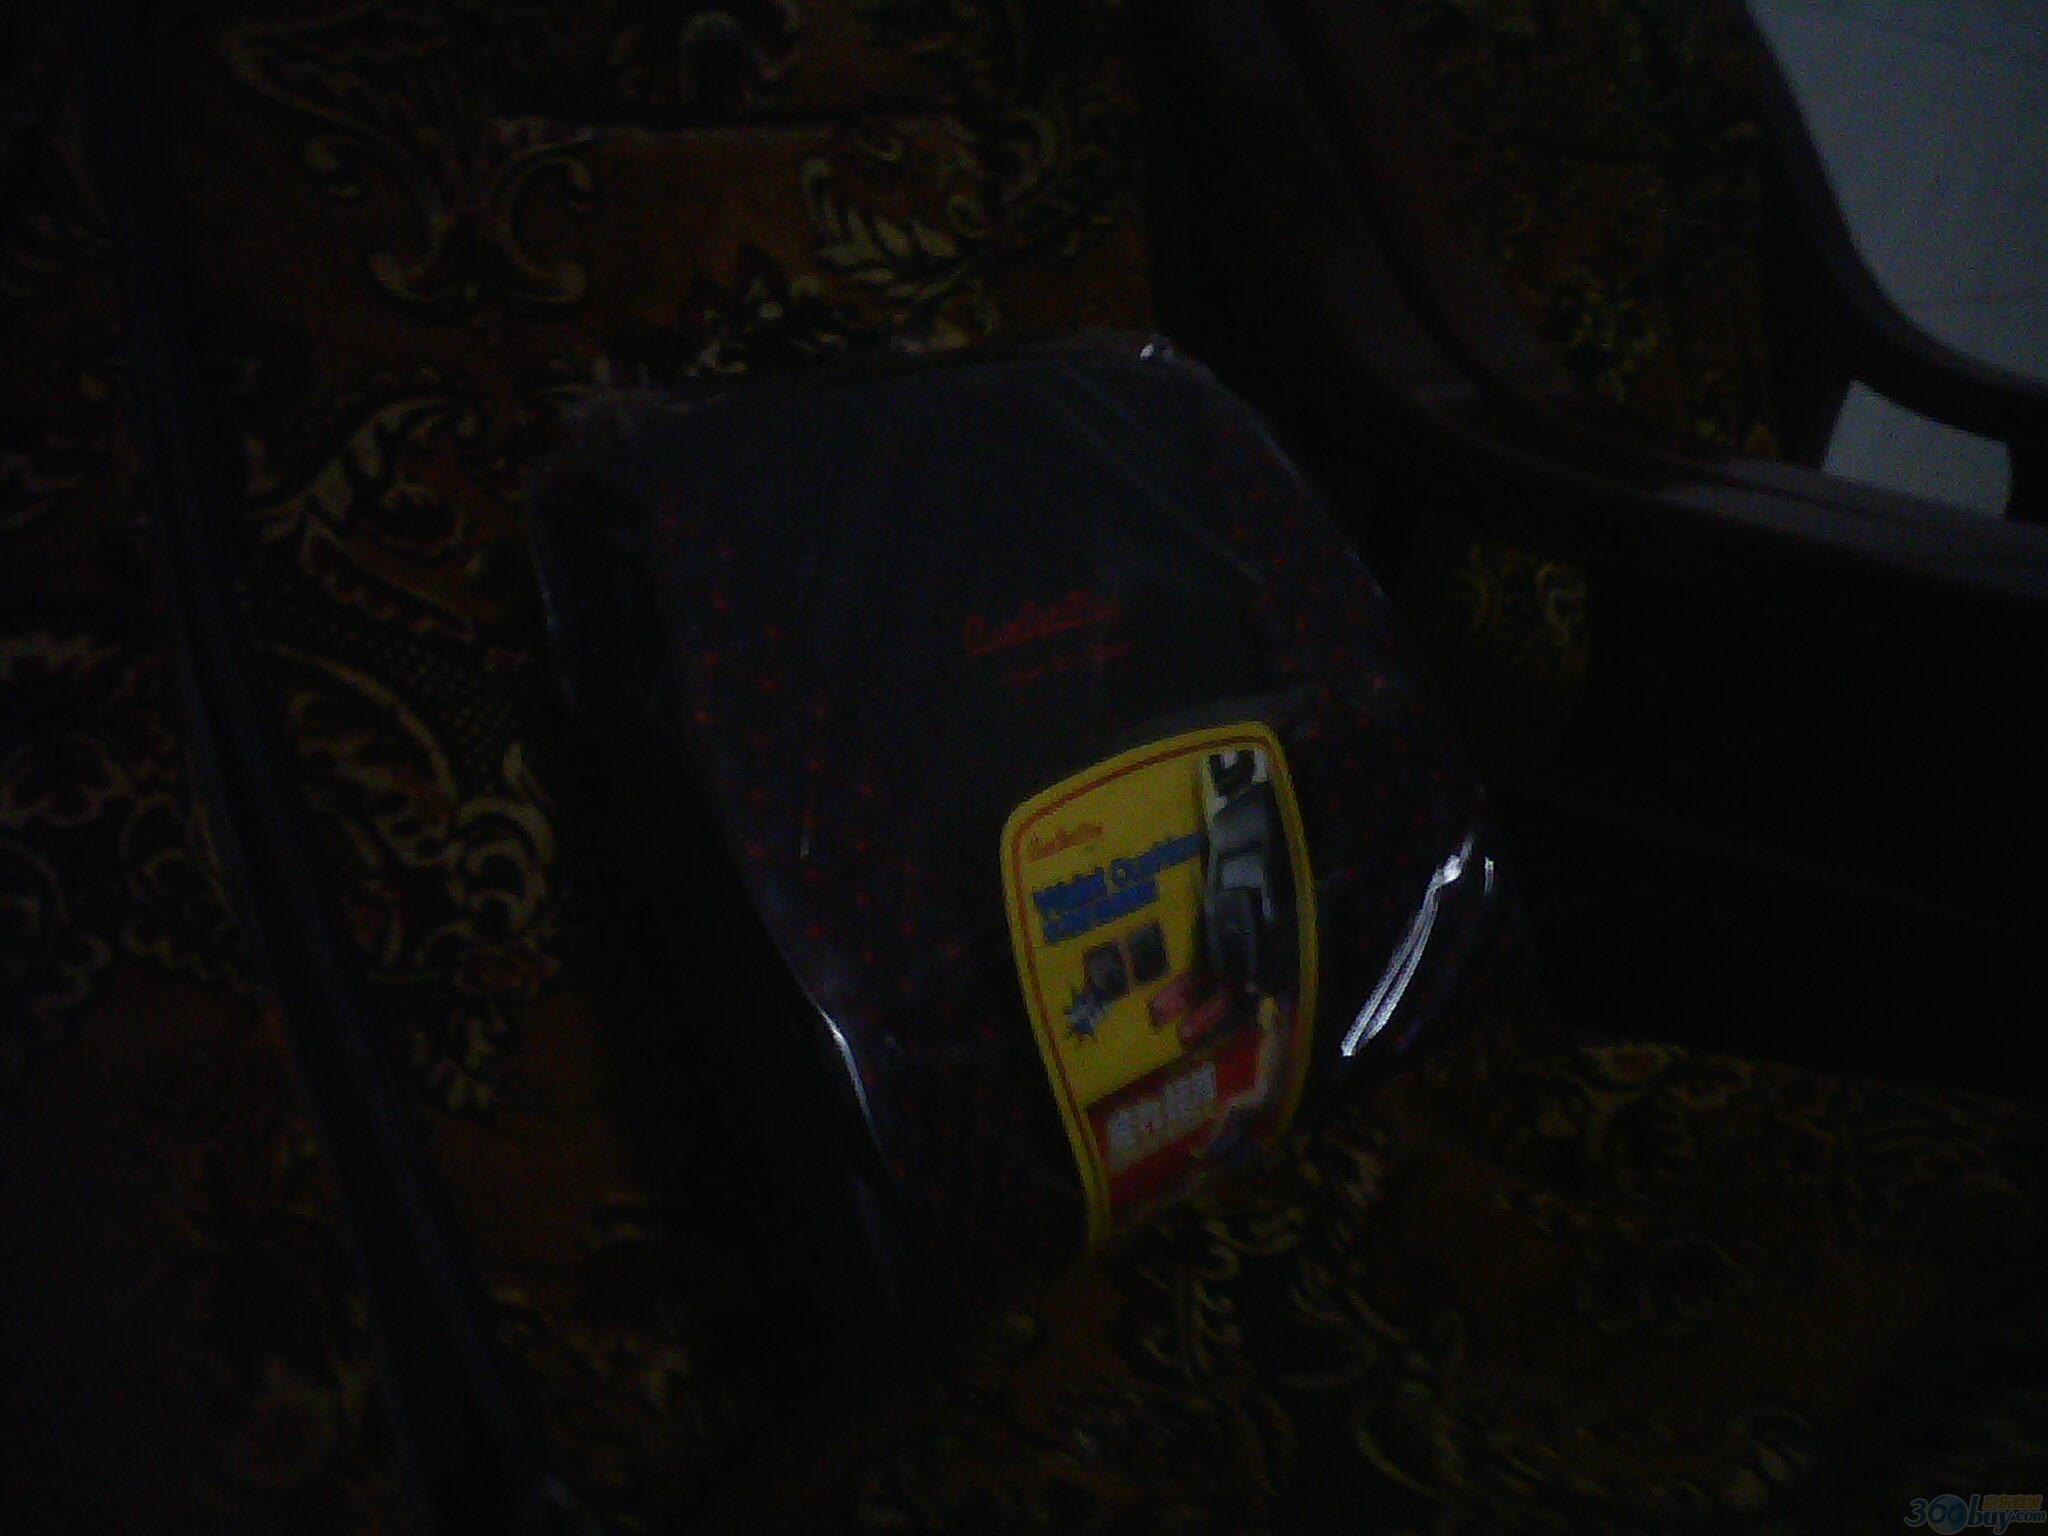 air jordan retro shoes 00230442 replica